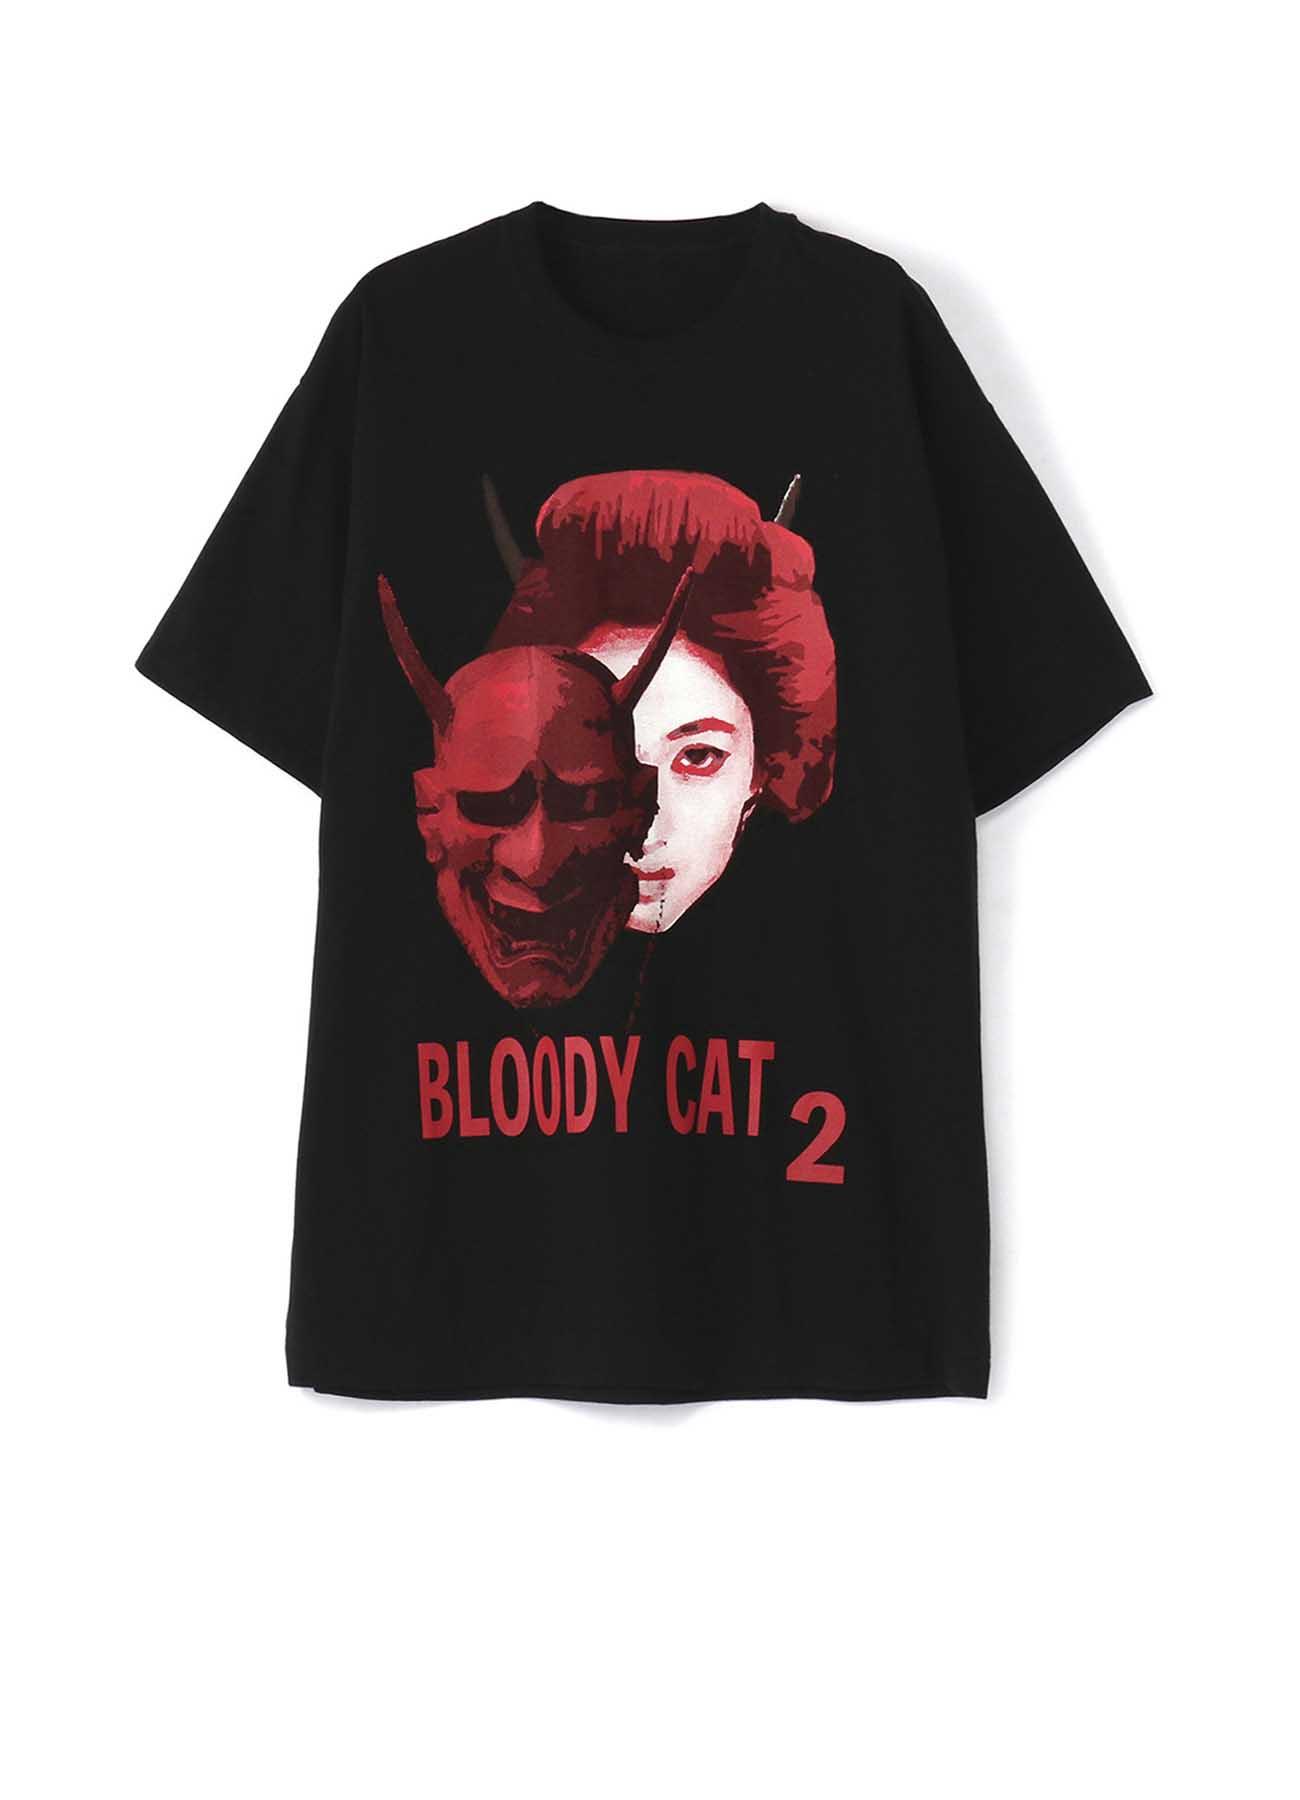 20/CottonJersey Bloody Cat 2 T-Shirt